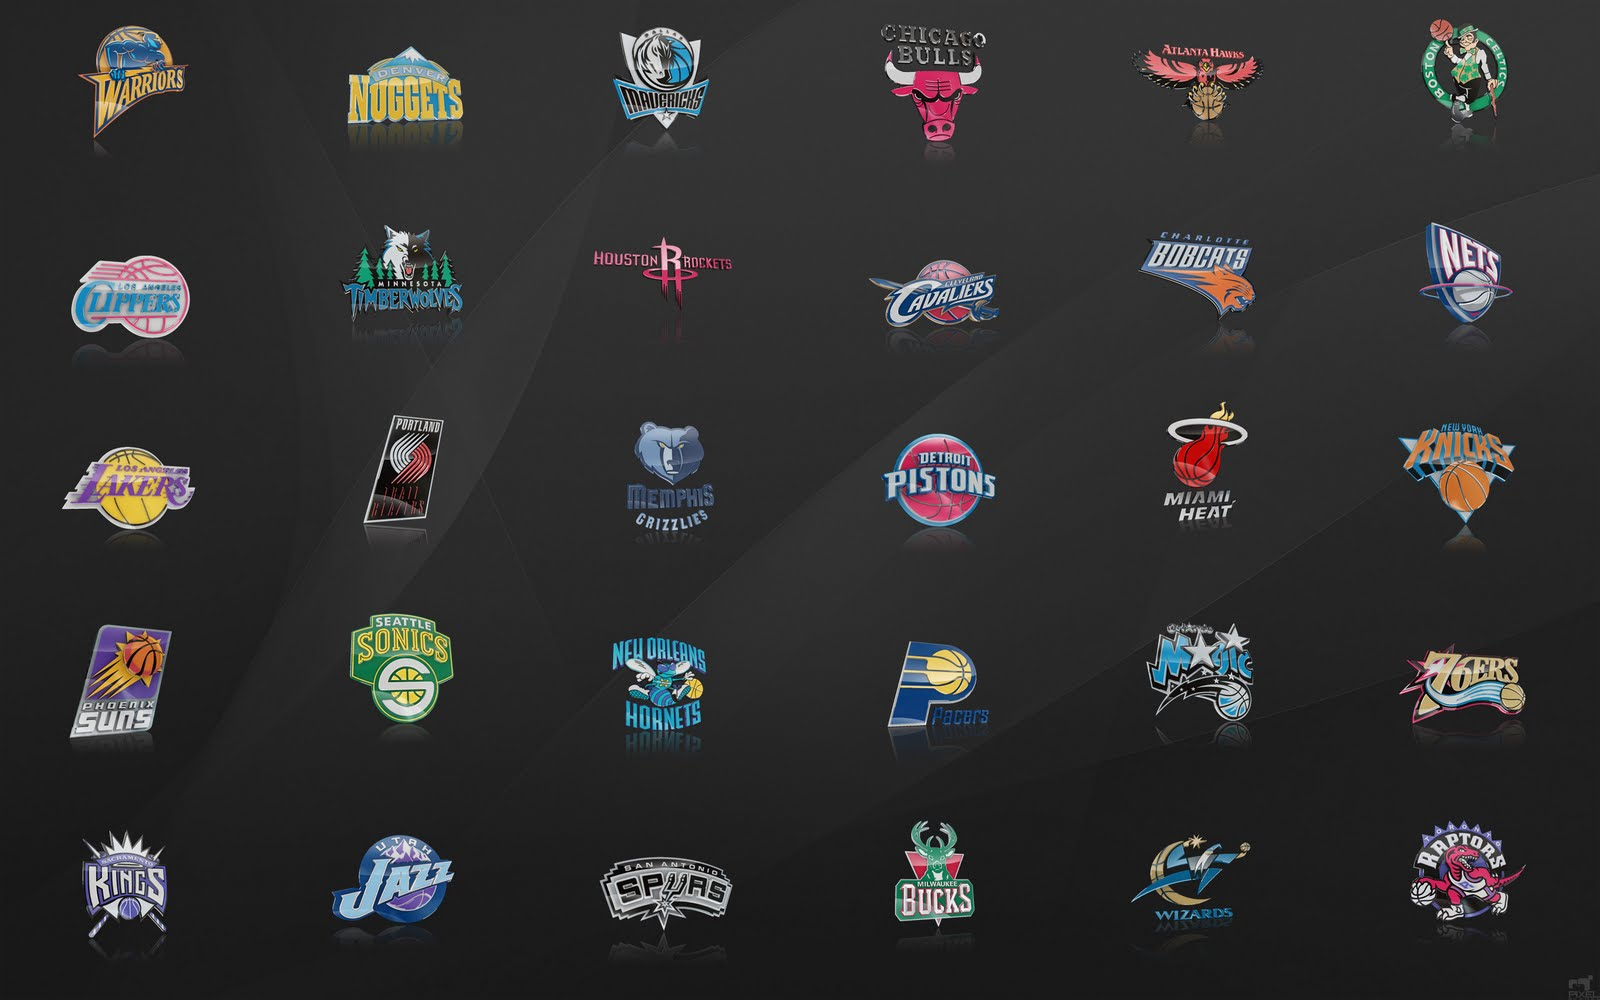 NBA wallpaper Teams logo NBA Wallpaper 1600x1000